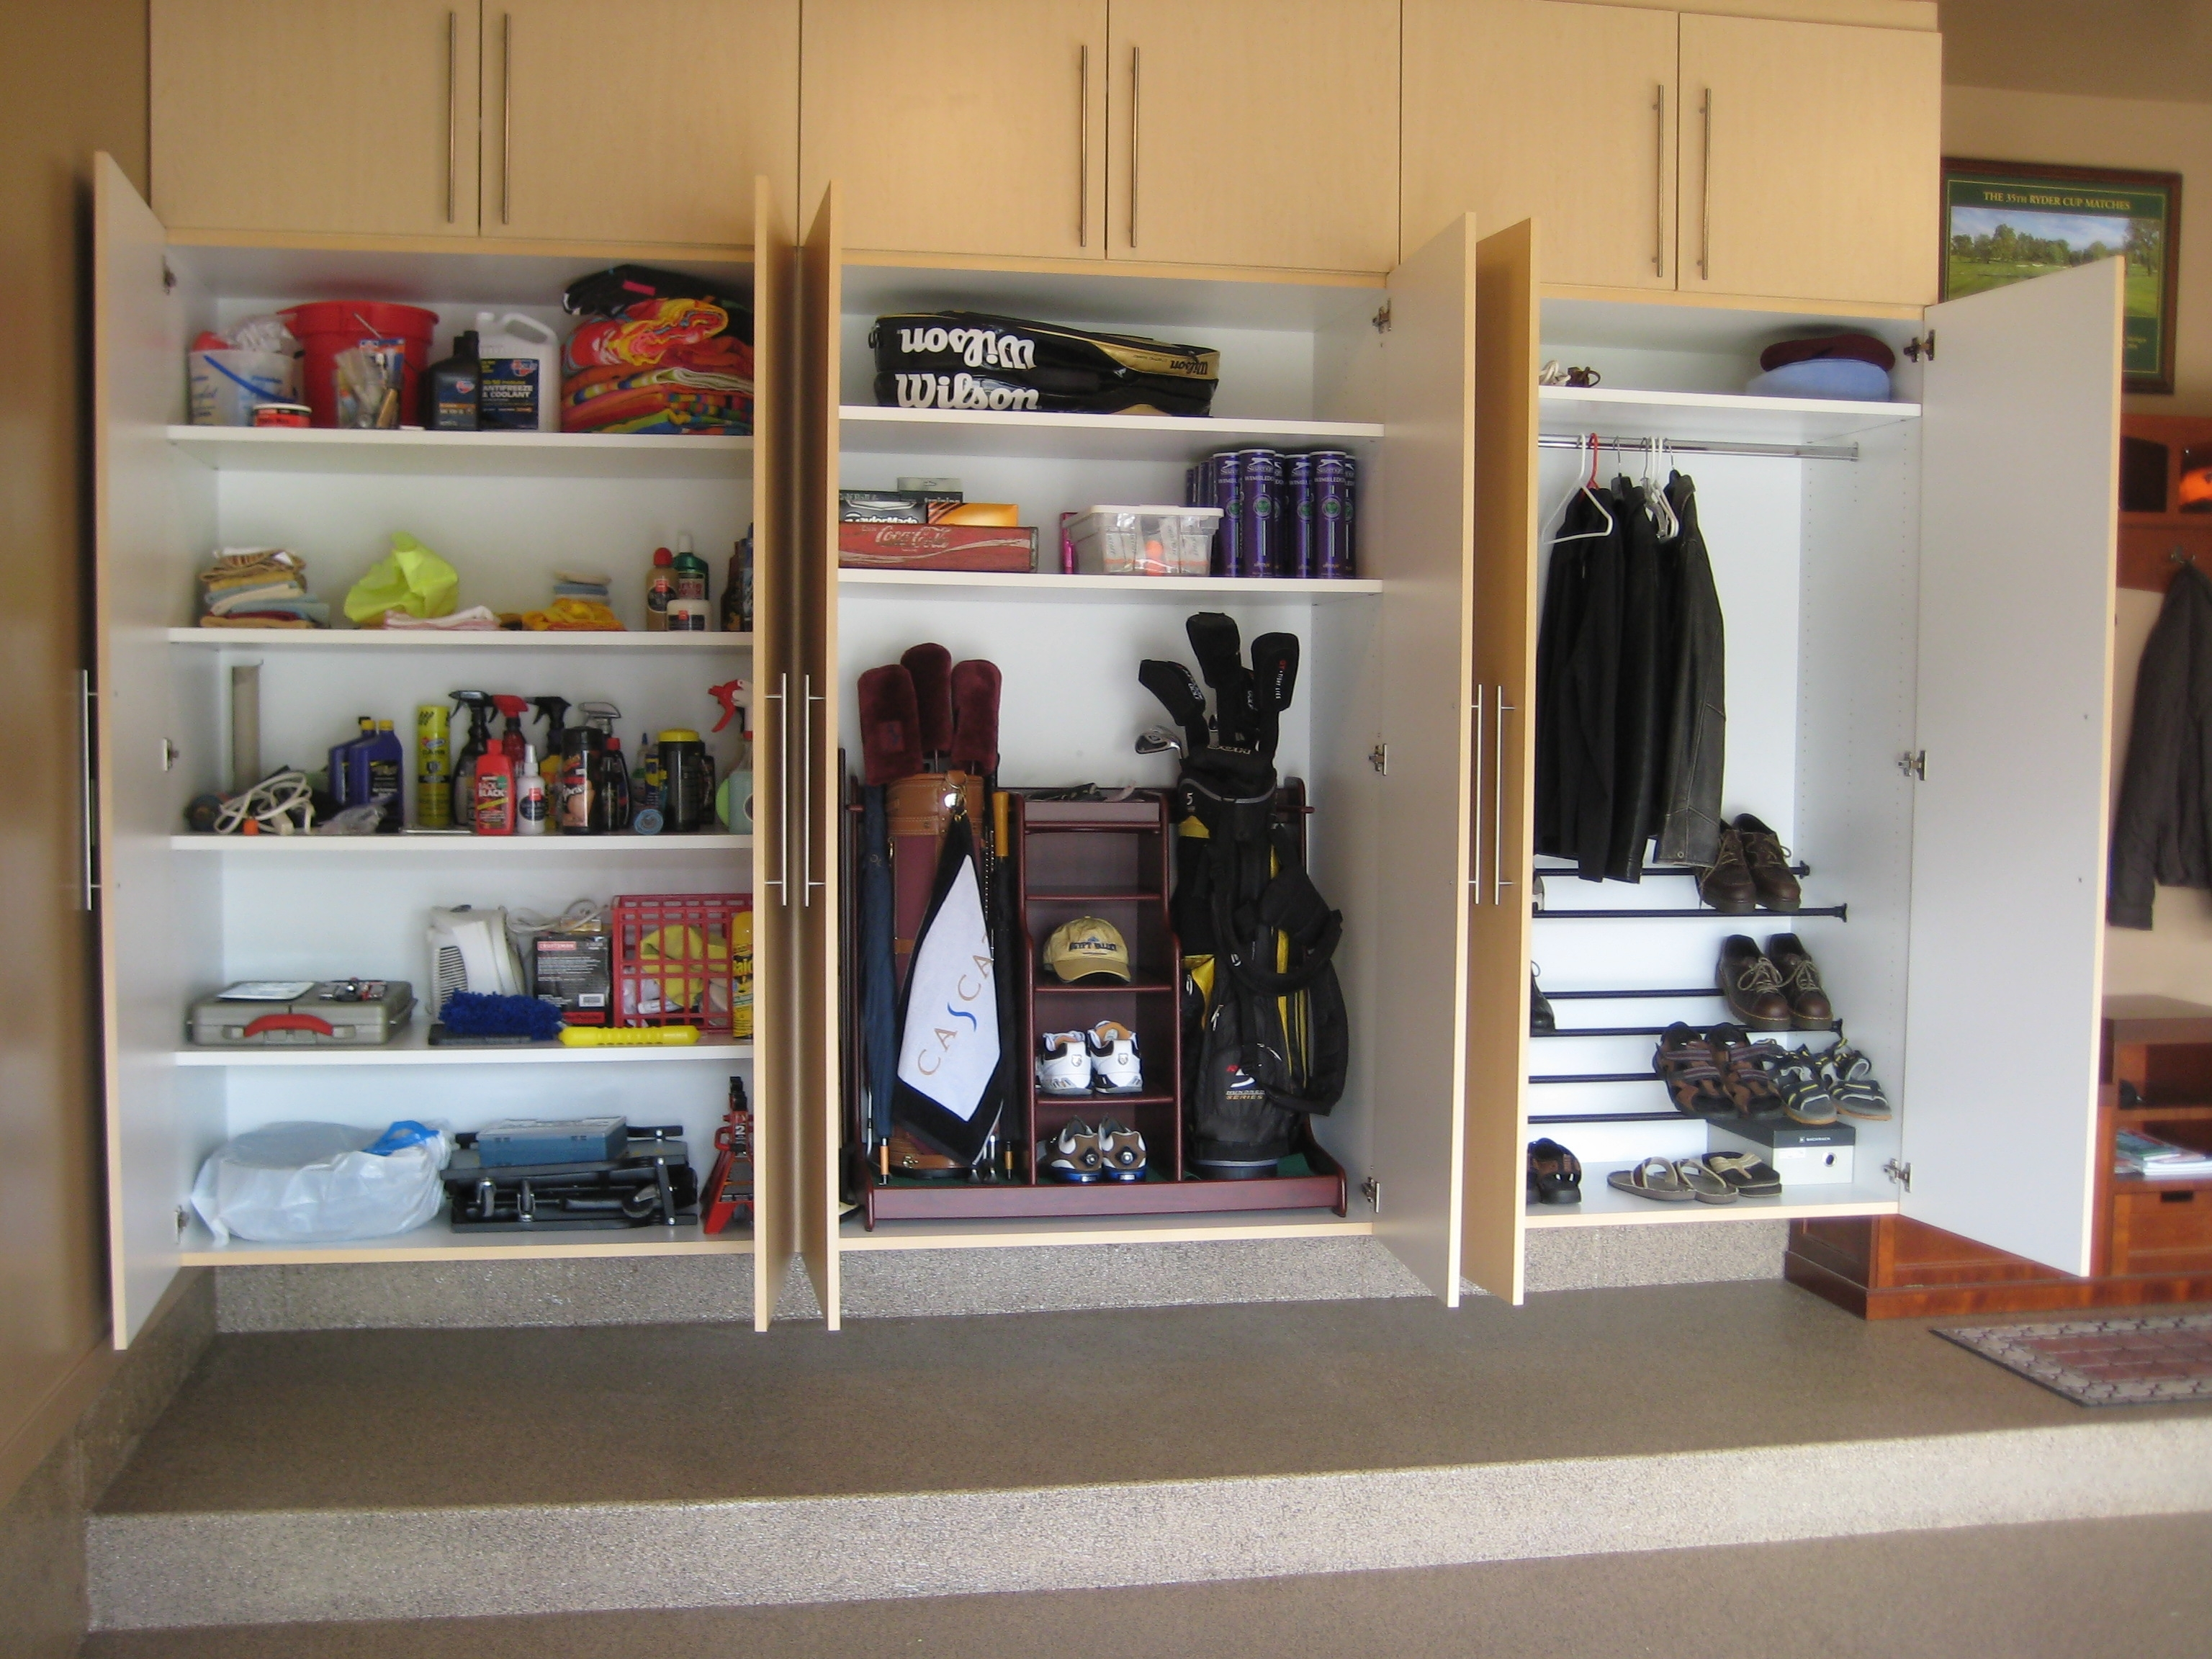 To Reuse Kitchen Shutters As Garage Storage Units ...